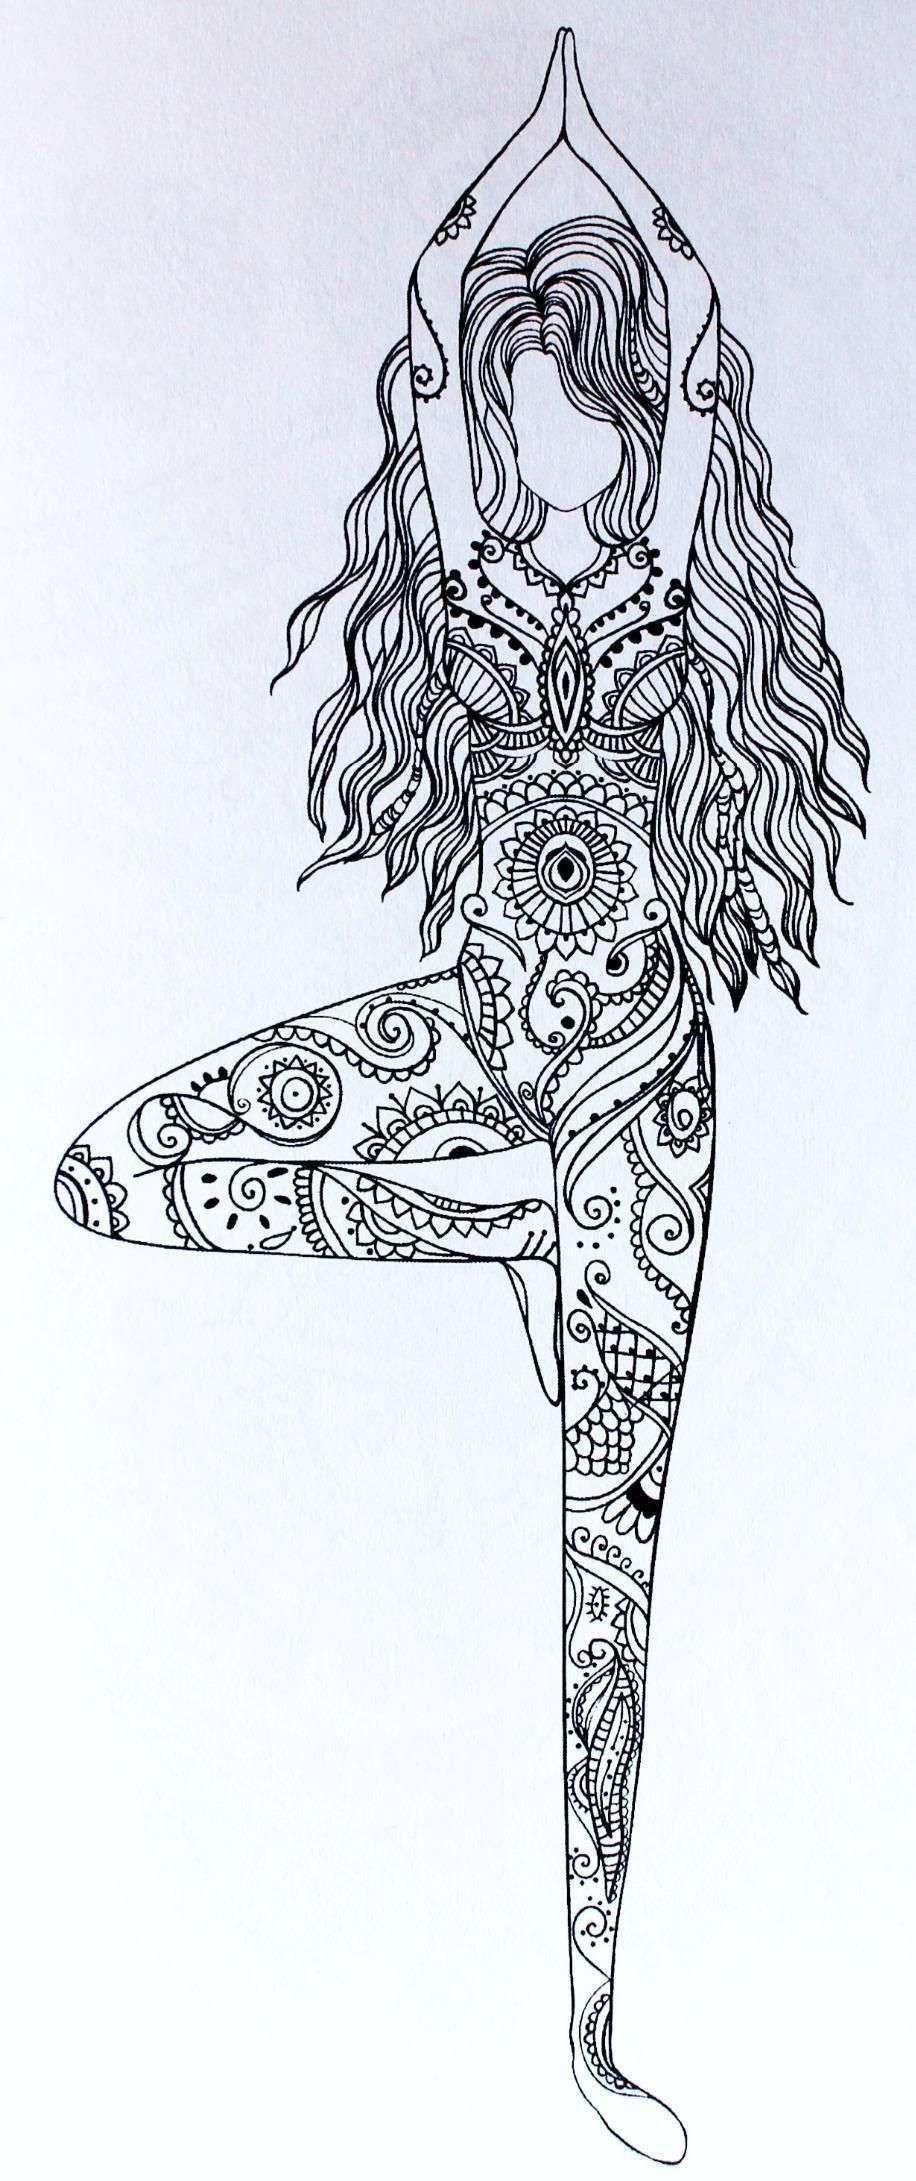 Pin de Adriana Azorín Marce en Varios | Pinterest | Mandalas, Dibujo ...